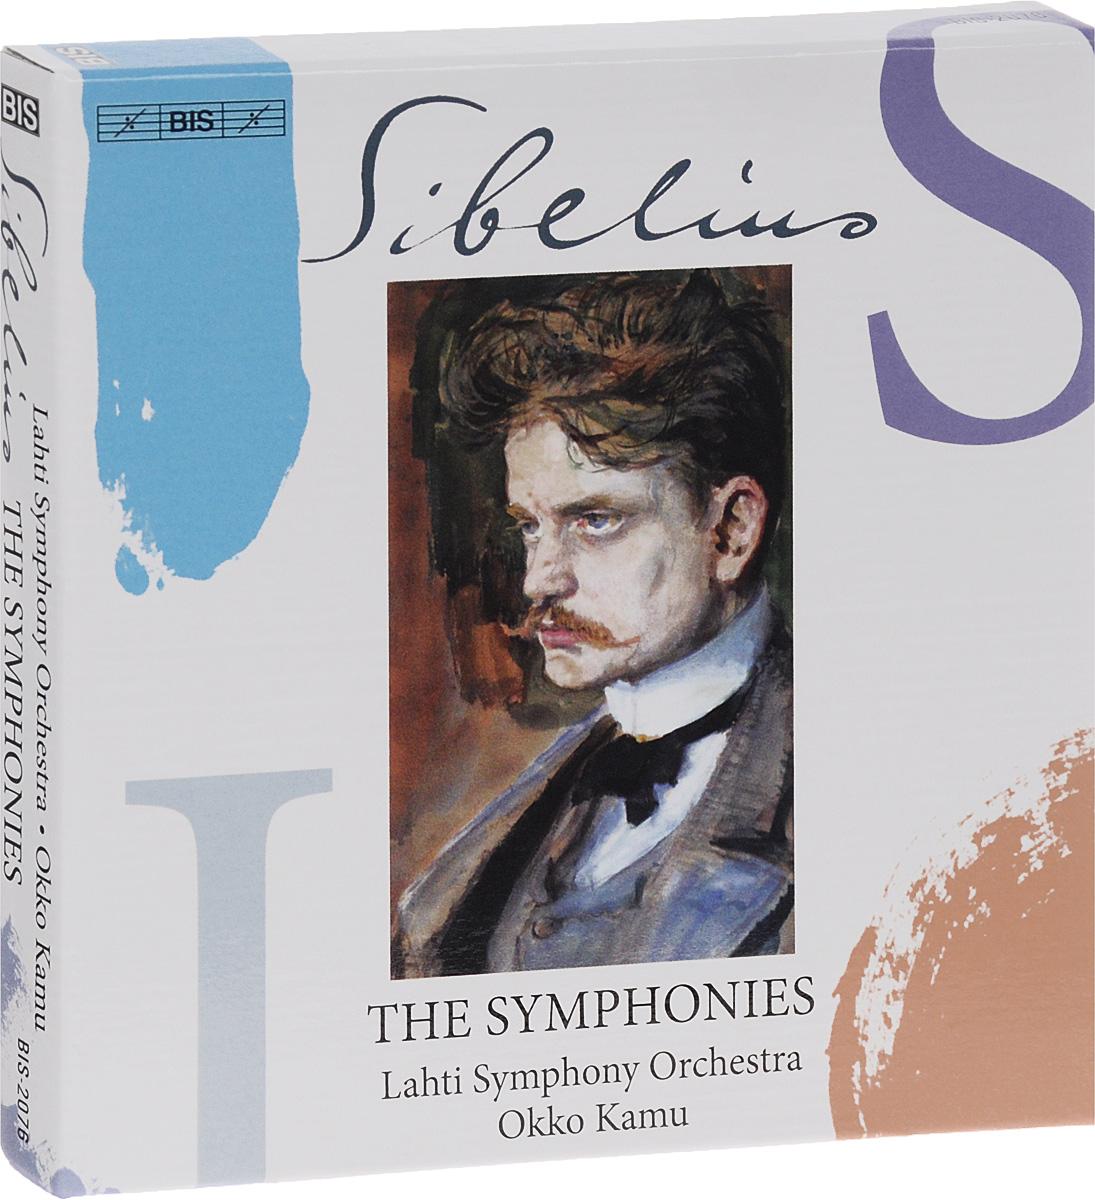 Lahti Symphony Orchestra. Okko Kamu. Sibelius. The Symphonies (3 SACD)